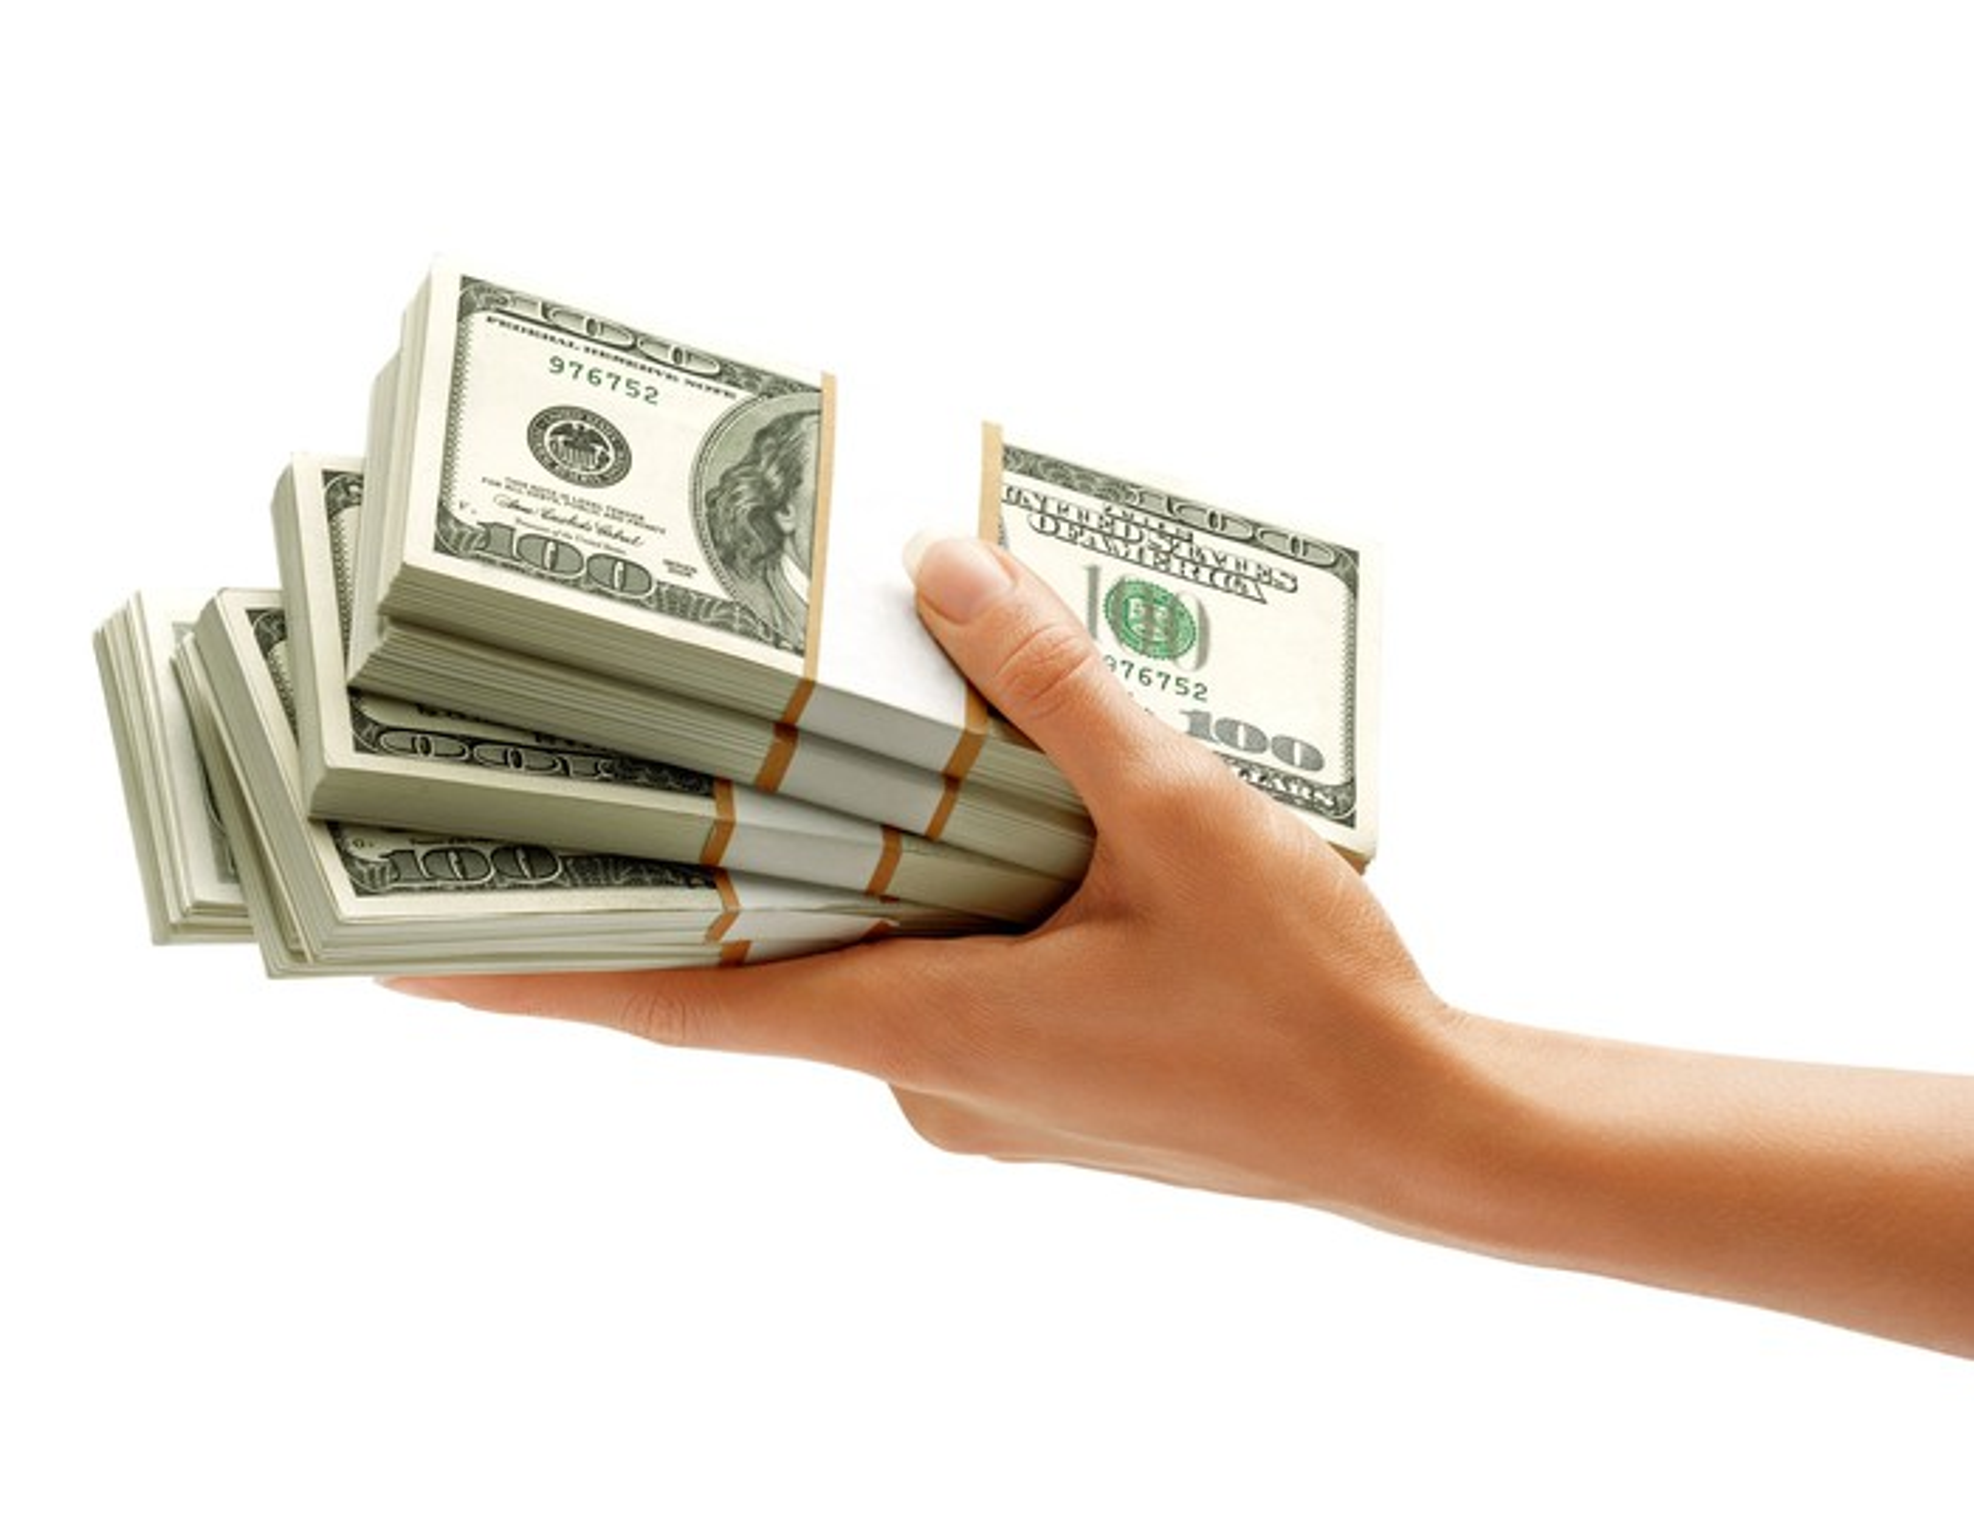 A hand handing over a big bunch of money